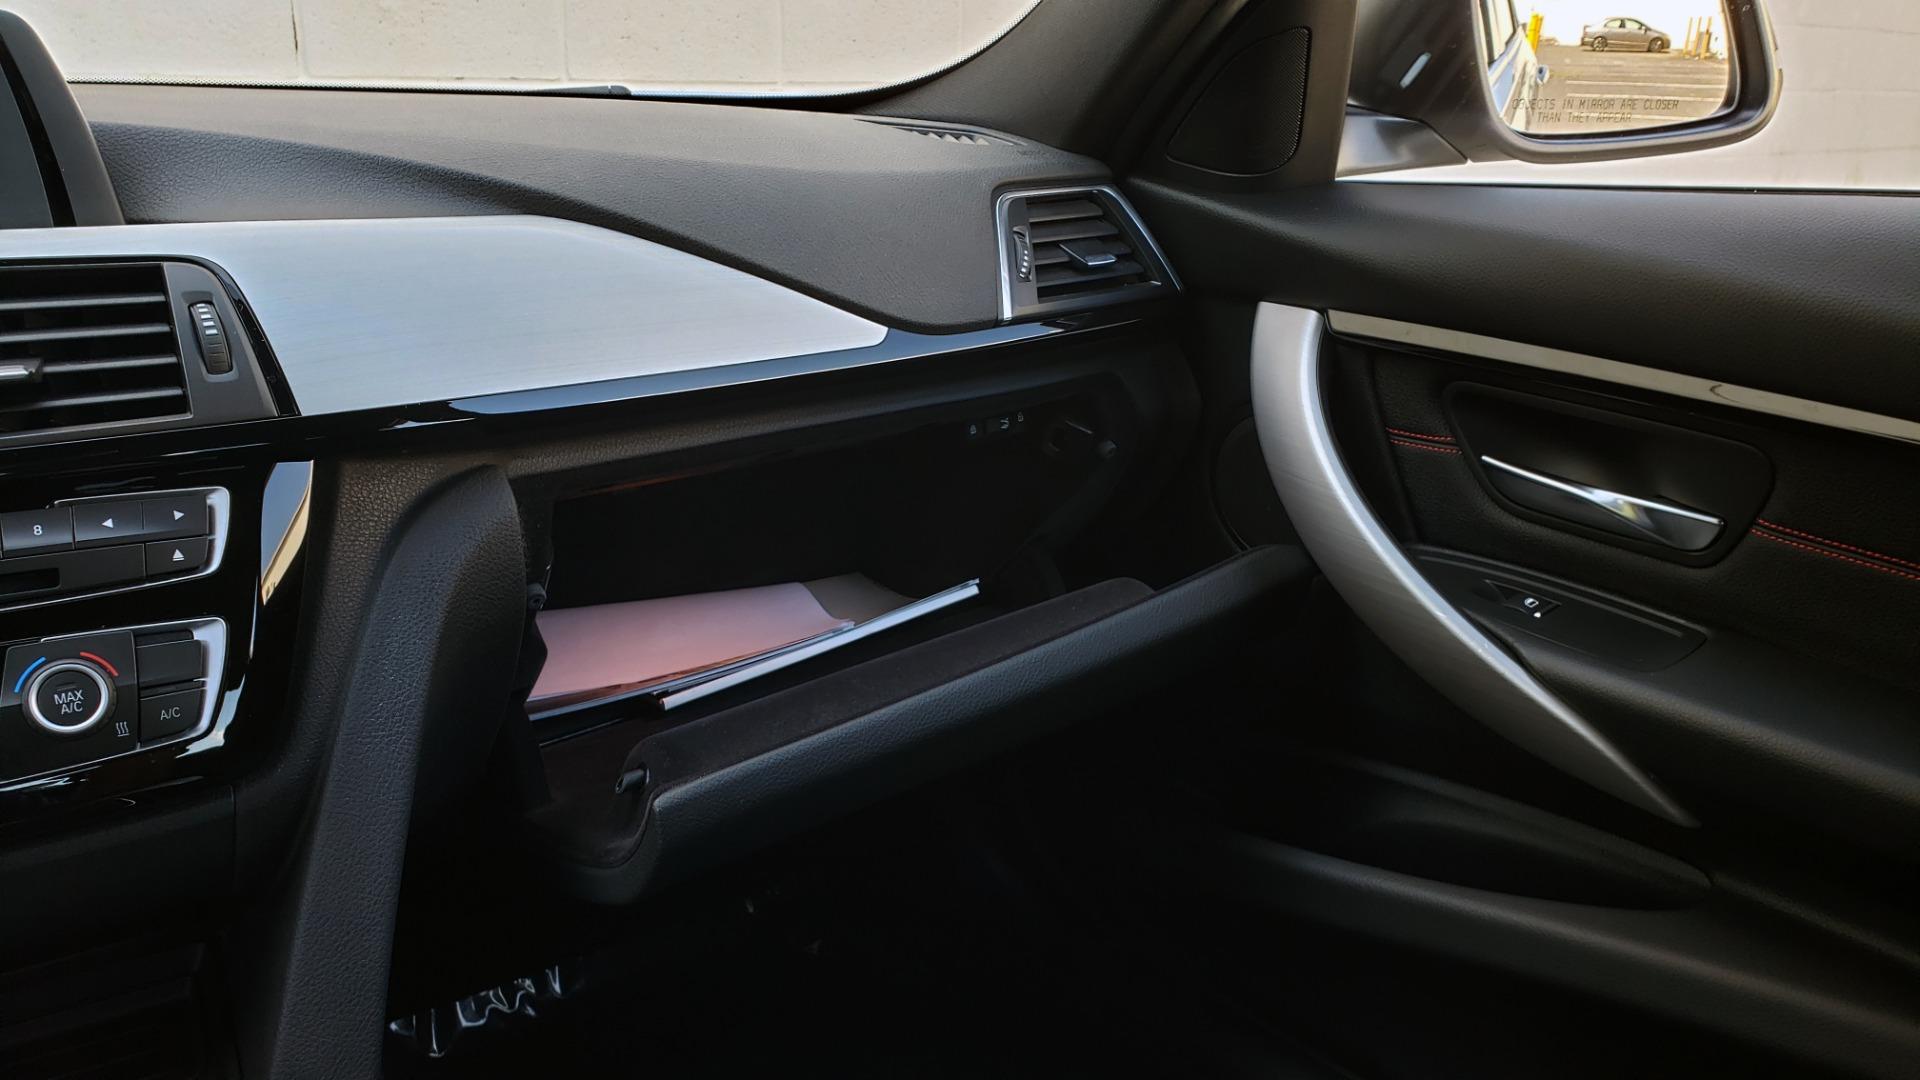 Used 2017 BMW 3 SERIES 330I SPORT SEDAN / DRVR ASST PKG / SUNROOF / REARVIEW for sale Sold at Formula Imports in Charlotte NC 28227 49